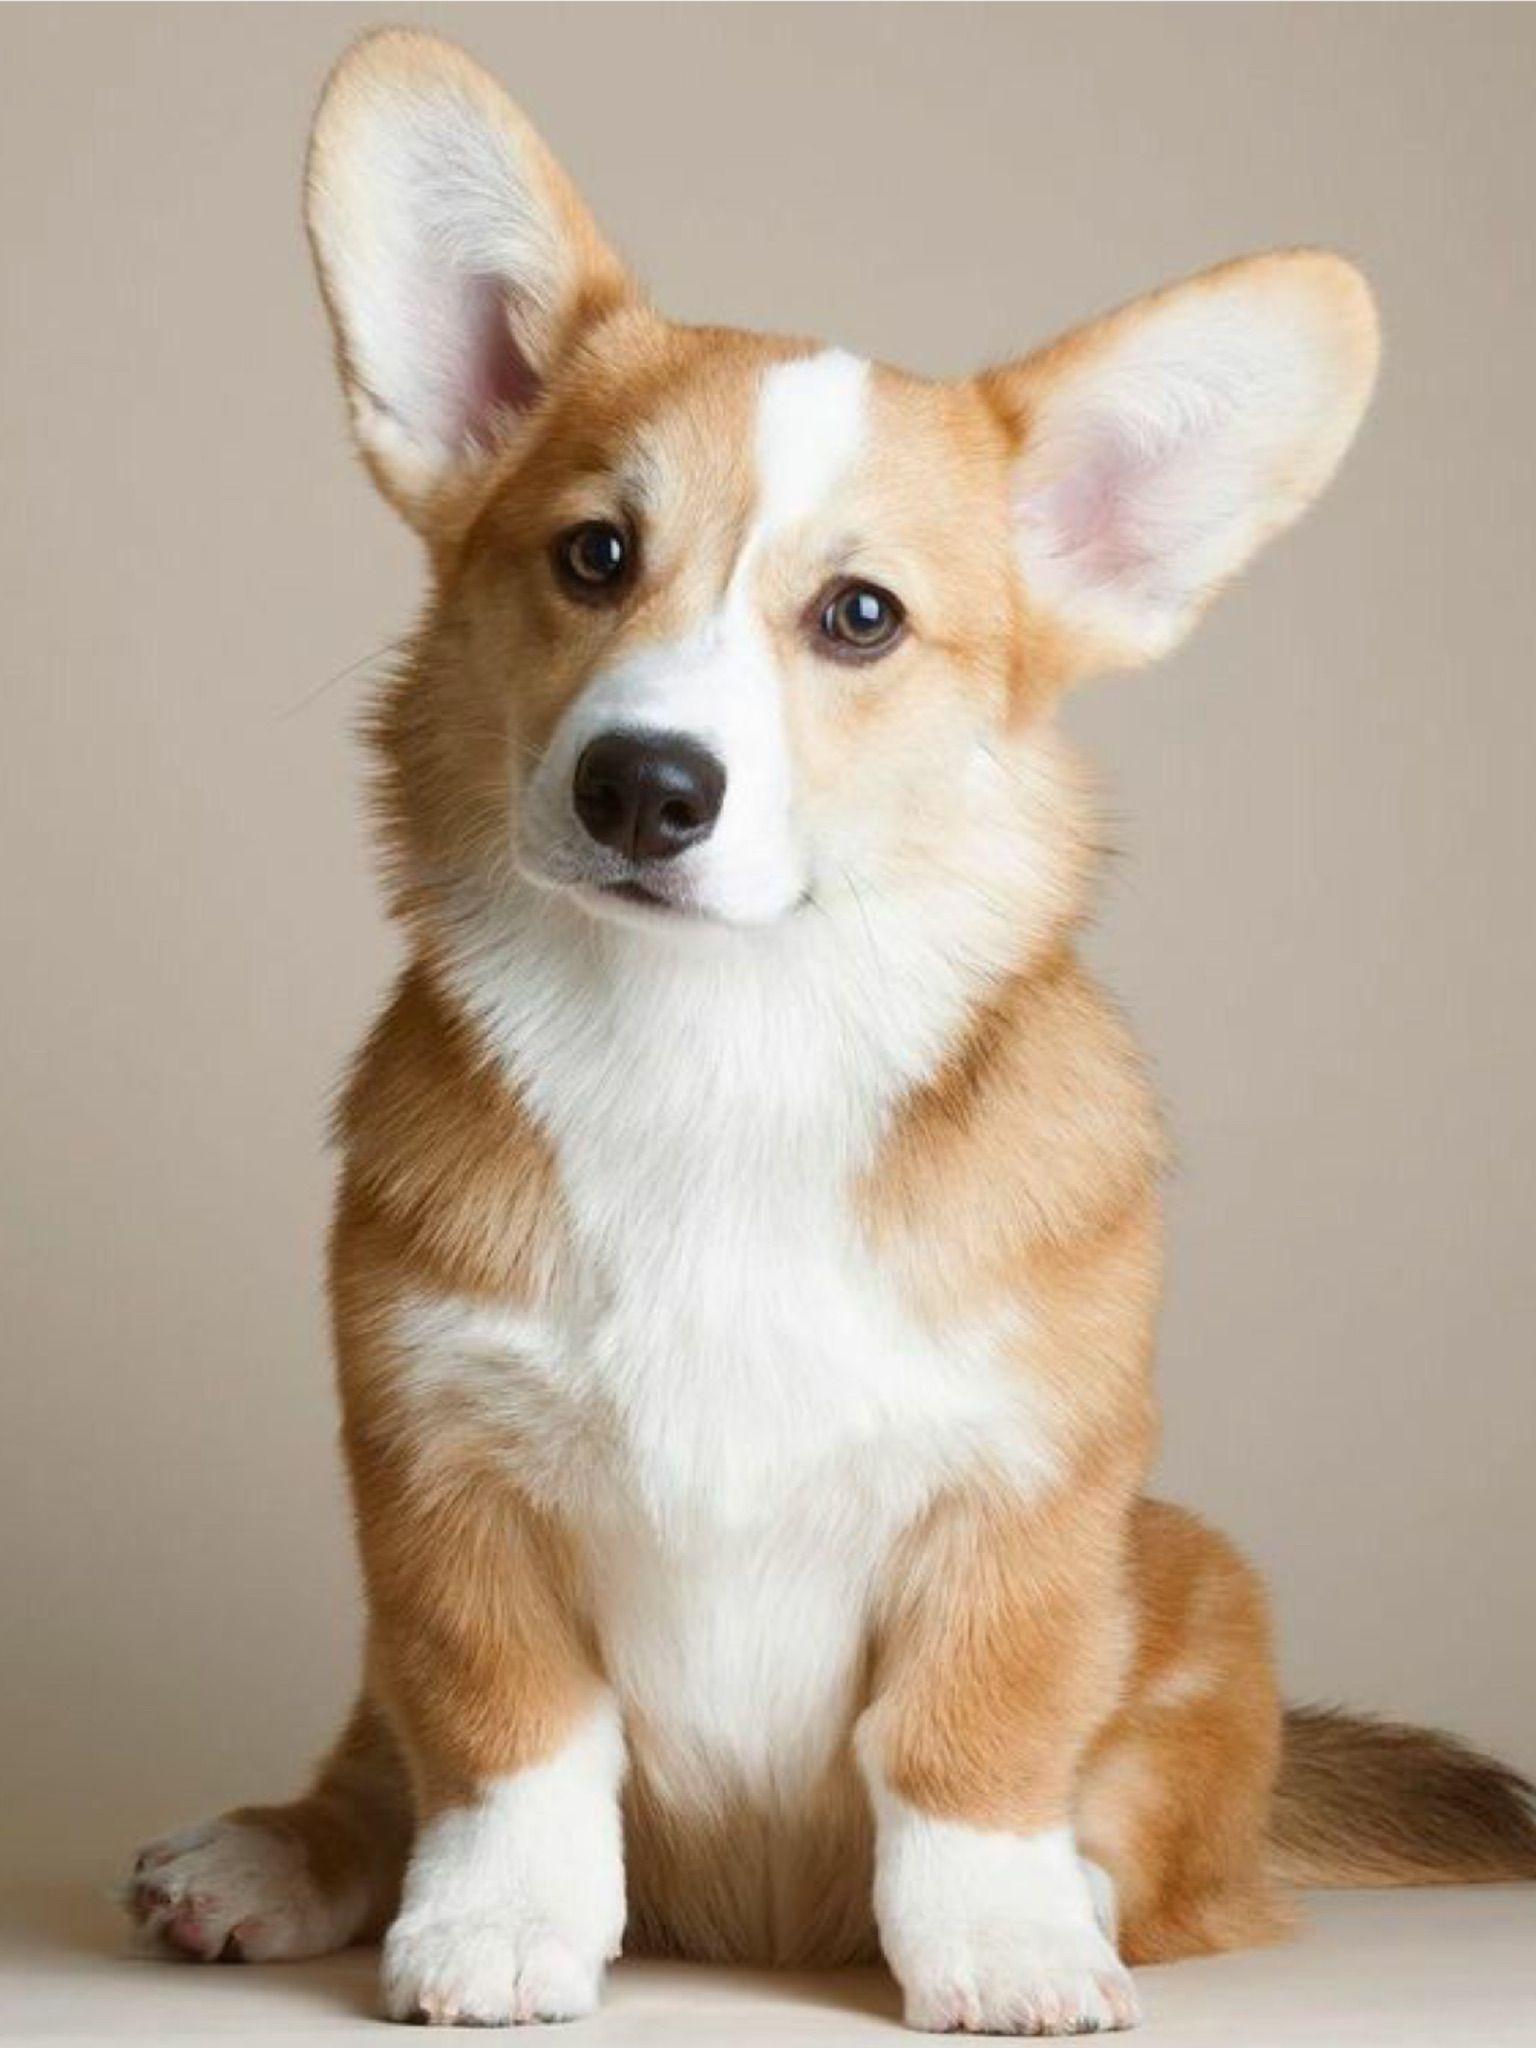 Pin By Debra Cancelliere On Animals Cuddly Corgis Corgi Animals Corgi Dog